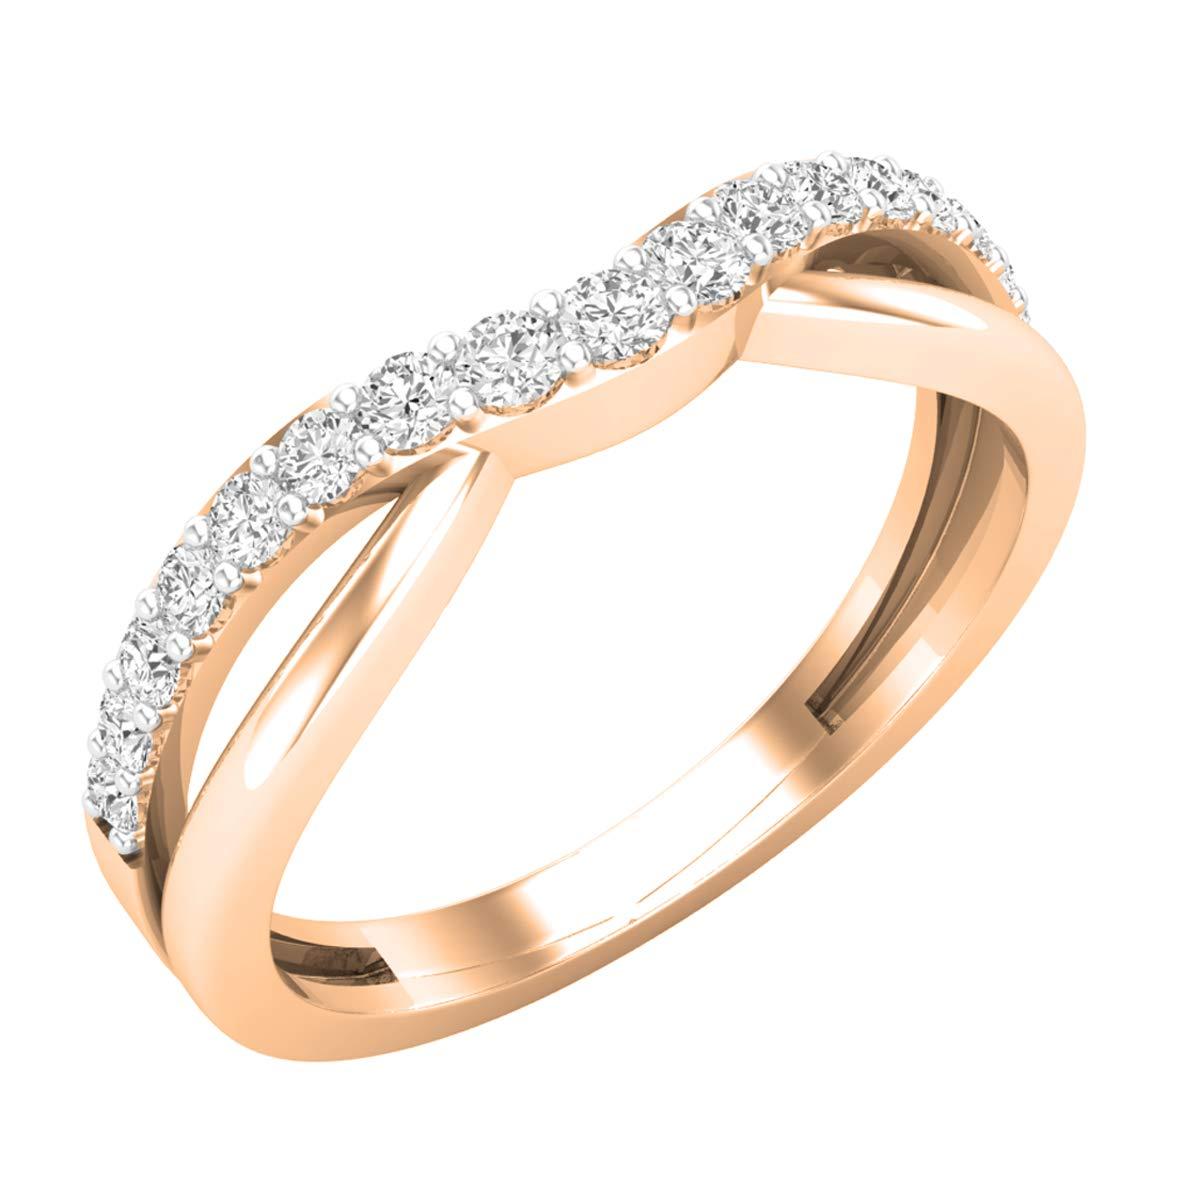 Dazzlingrock Collection 0.25 Carat (ctw) 14K Round Cut Diamond Ladies Wedding Guard Band 1/4 CT, Rose Gold, Size 6.5 by Dazzlingrock Collection